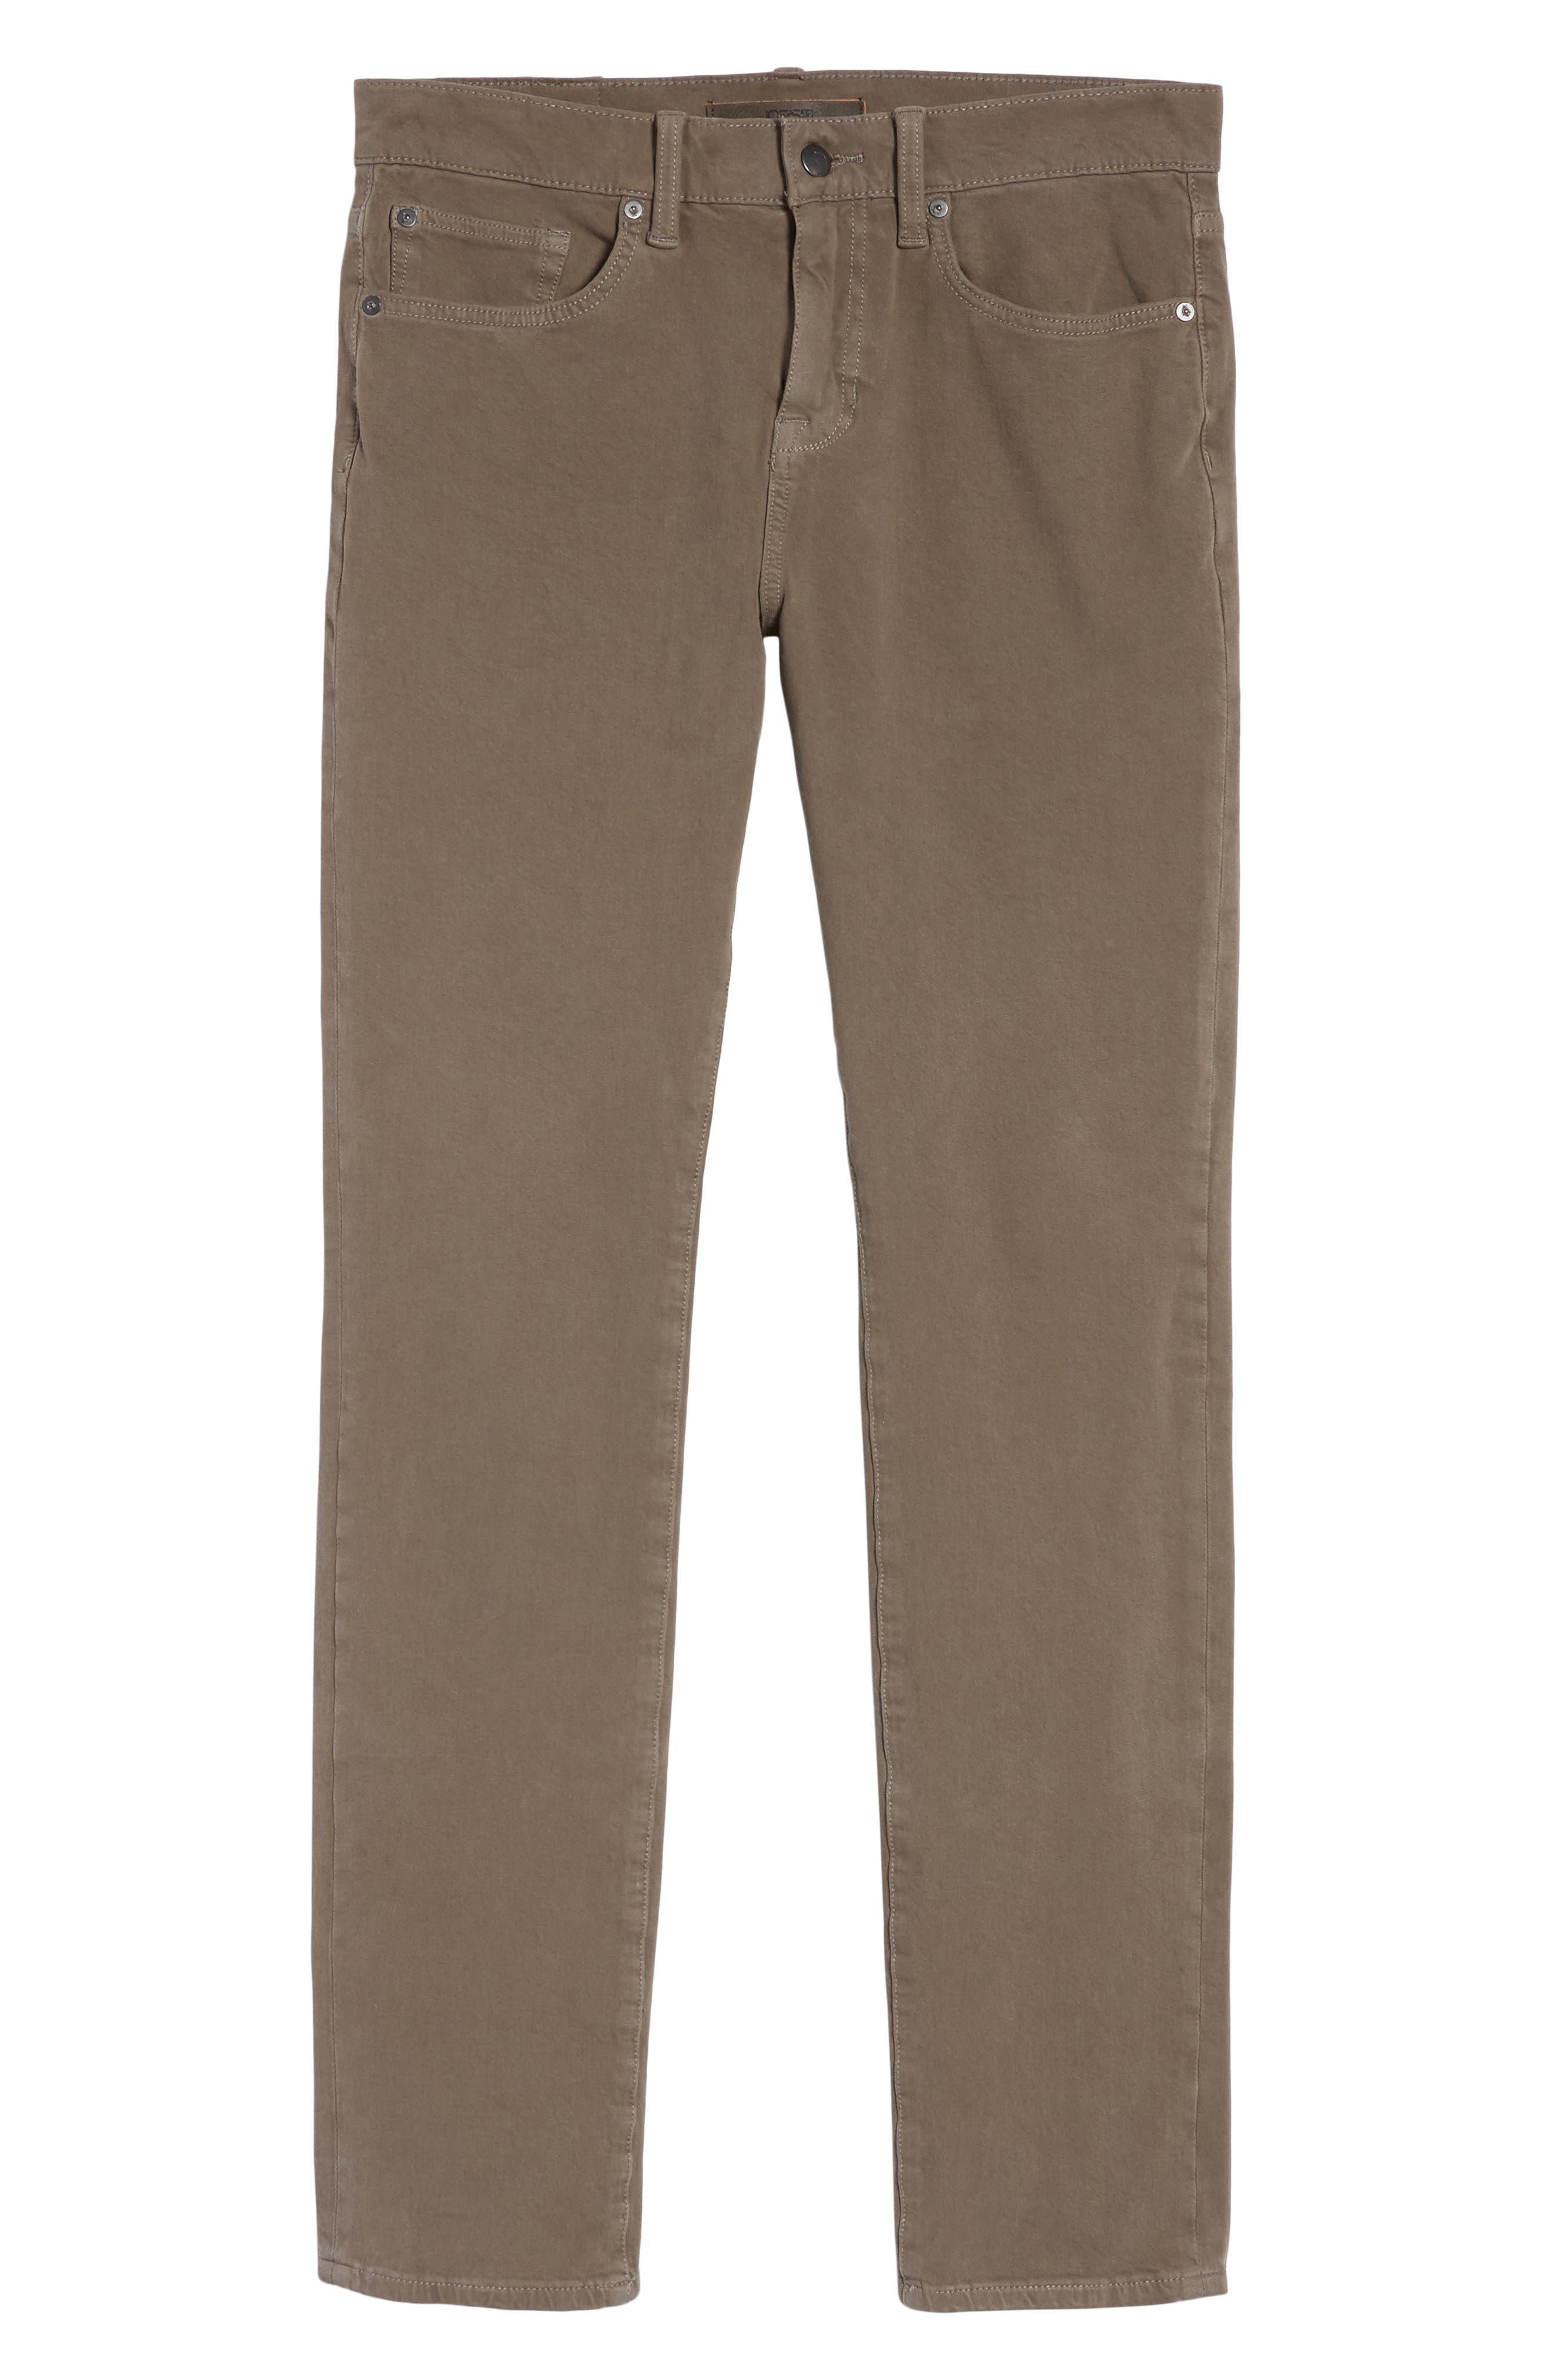 Kinetic Slim Fit Jeans,                             Alternate thumbnail 6, color,                             Stonehenge